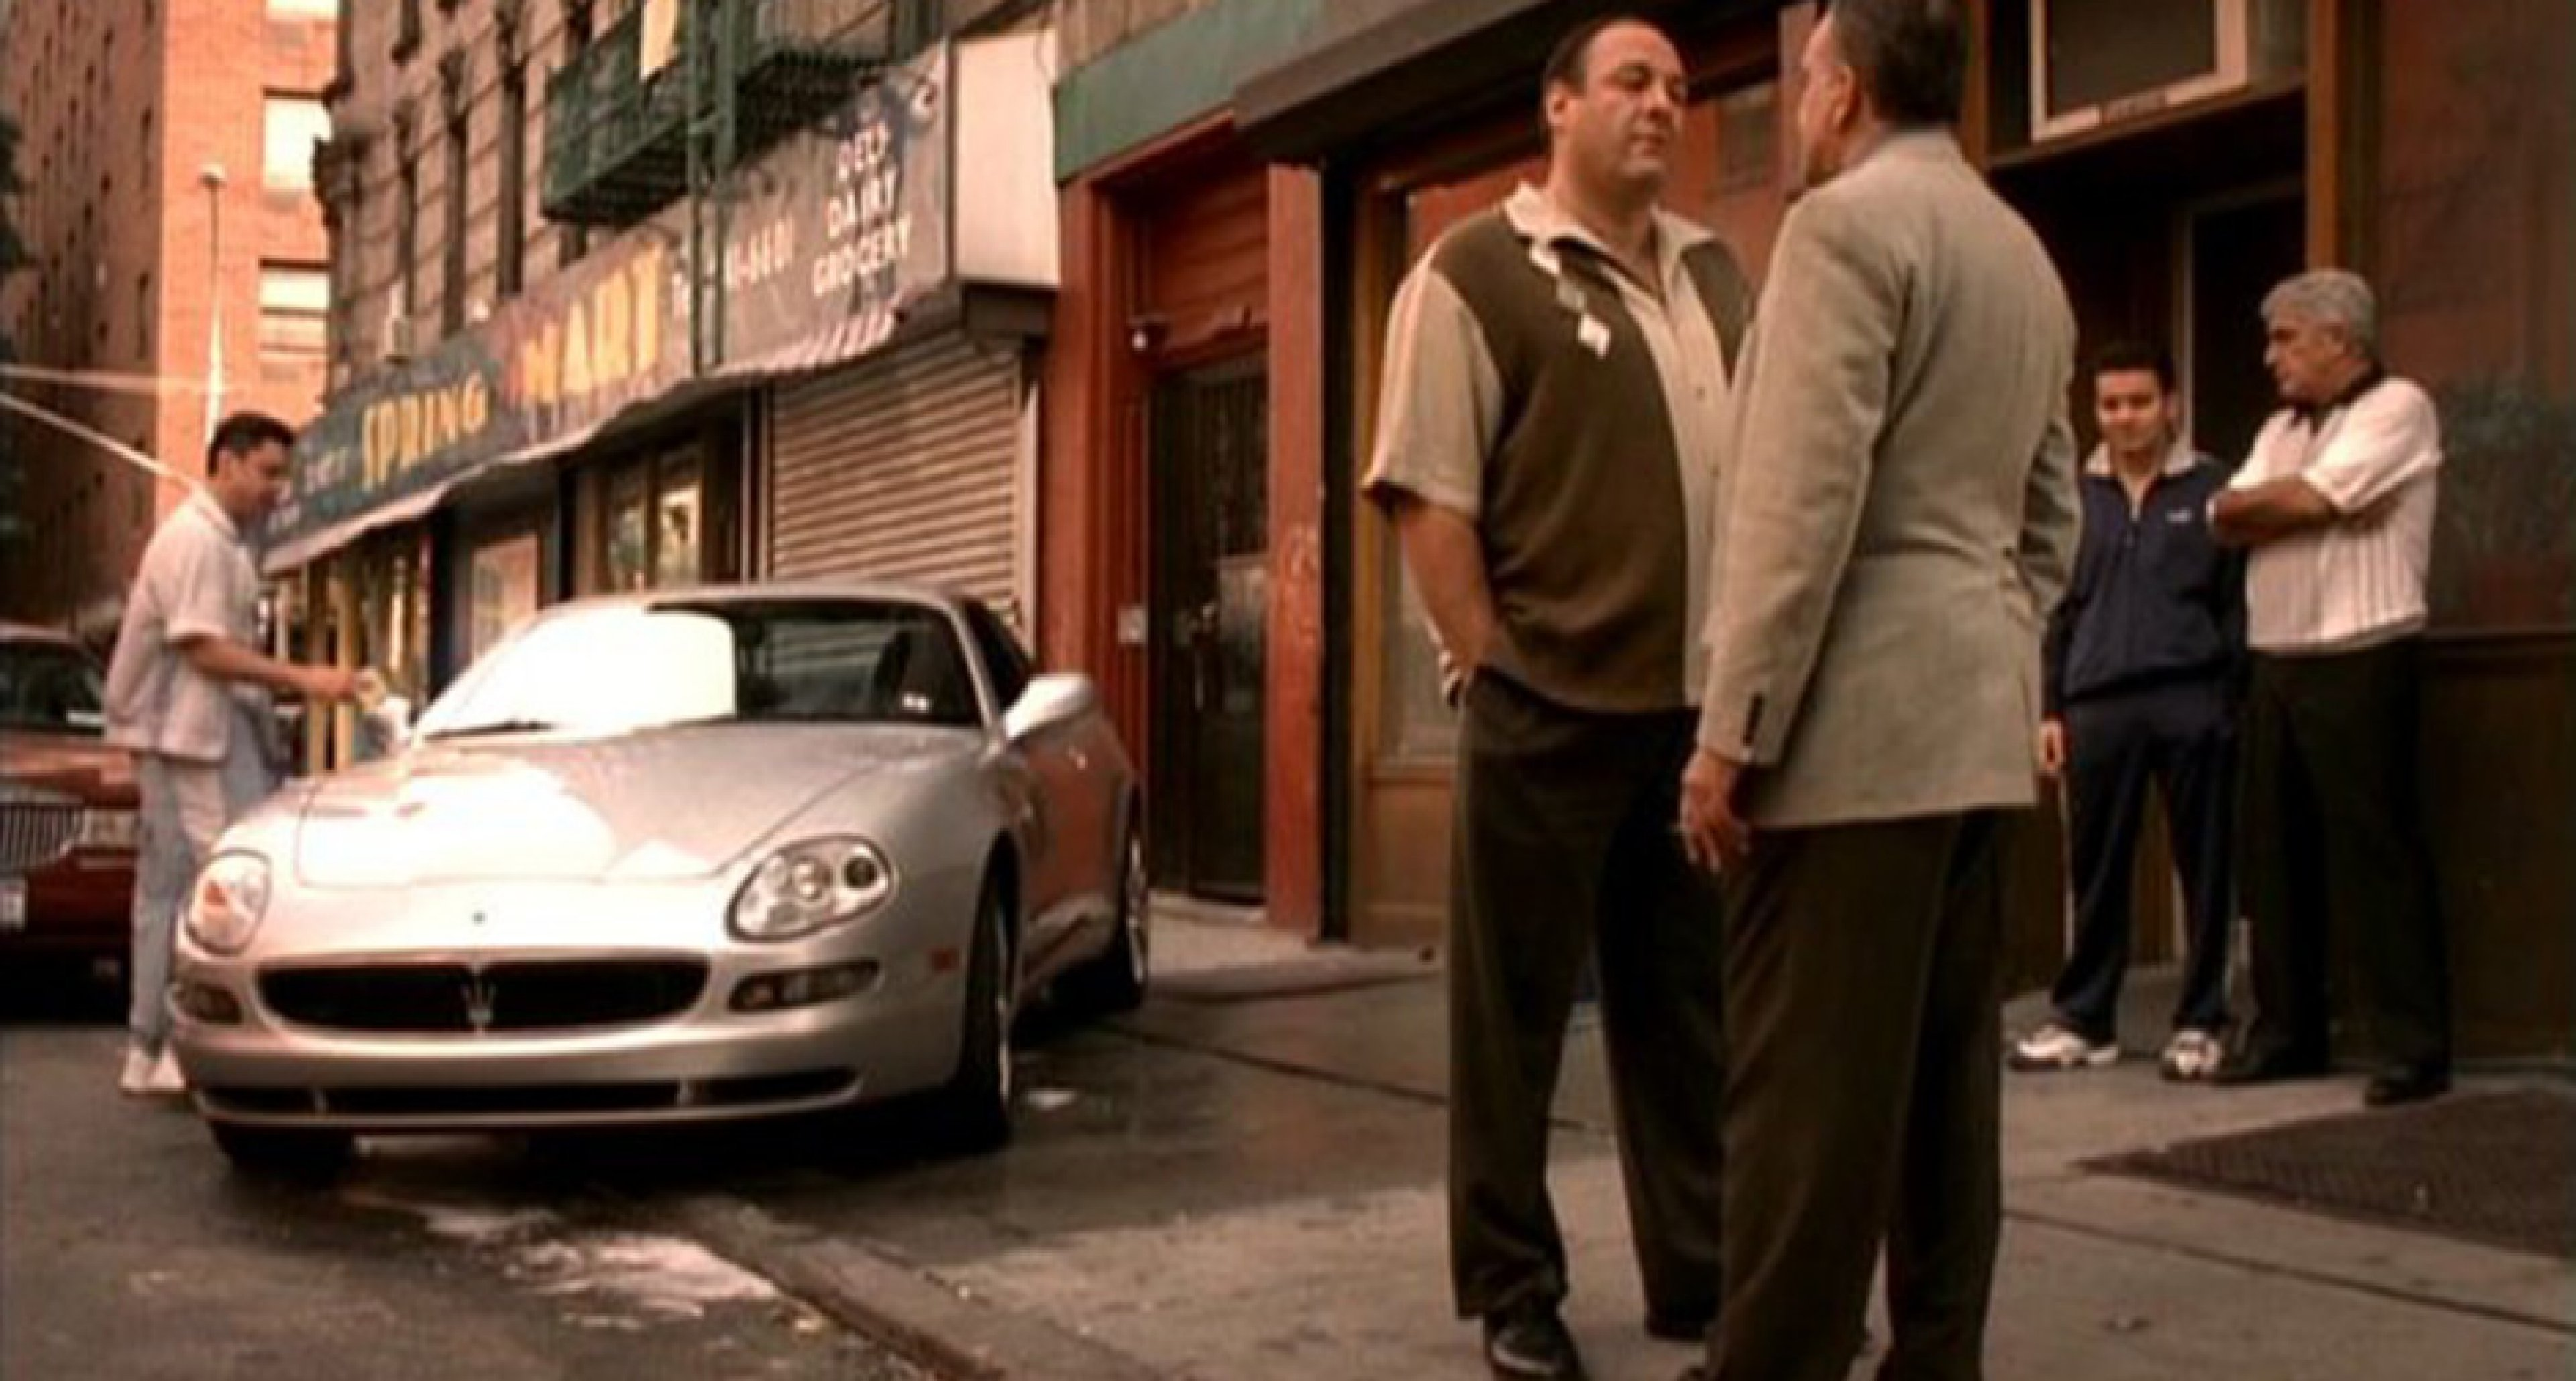 Johnny Sacrimoni's Maserati is washed in The Sopranos